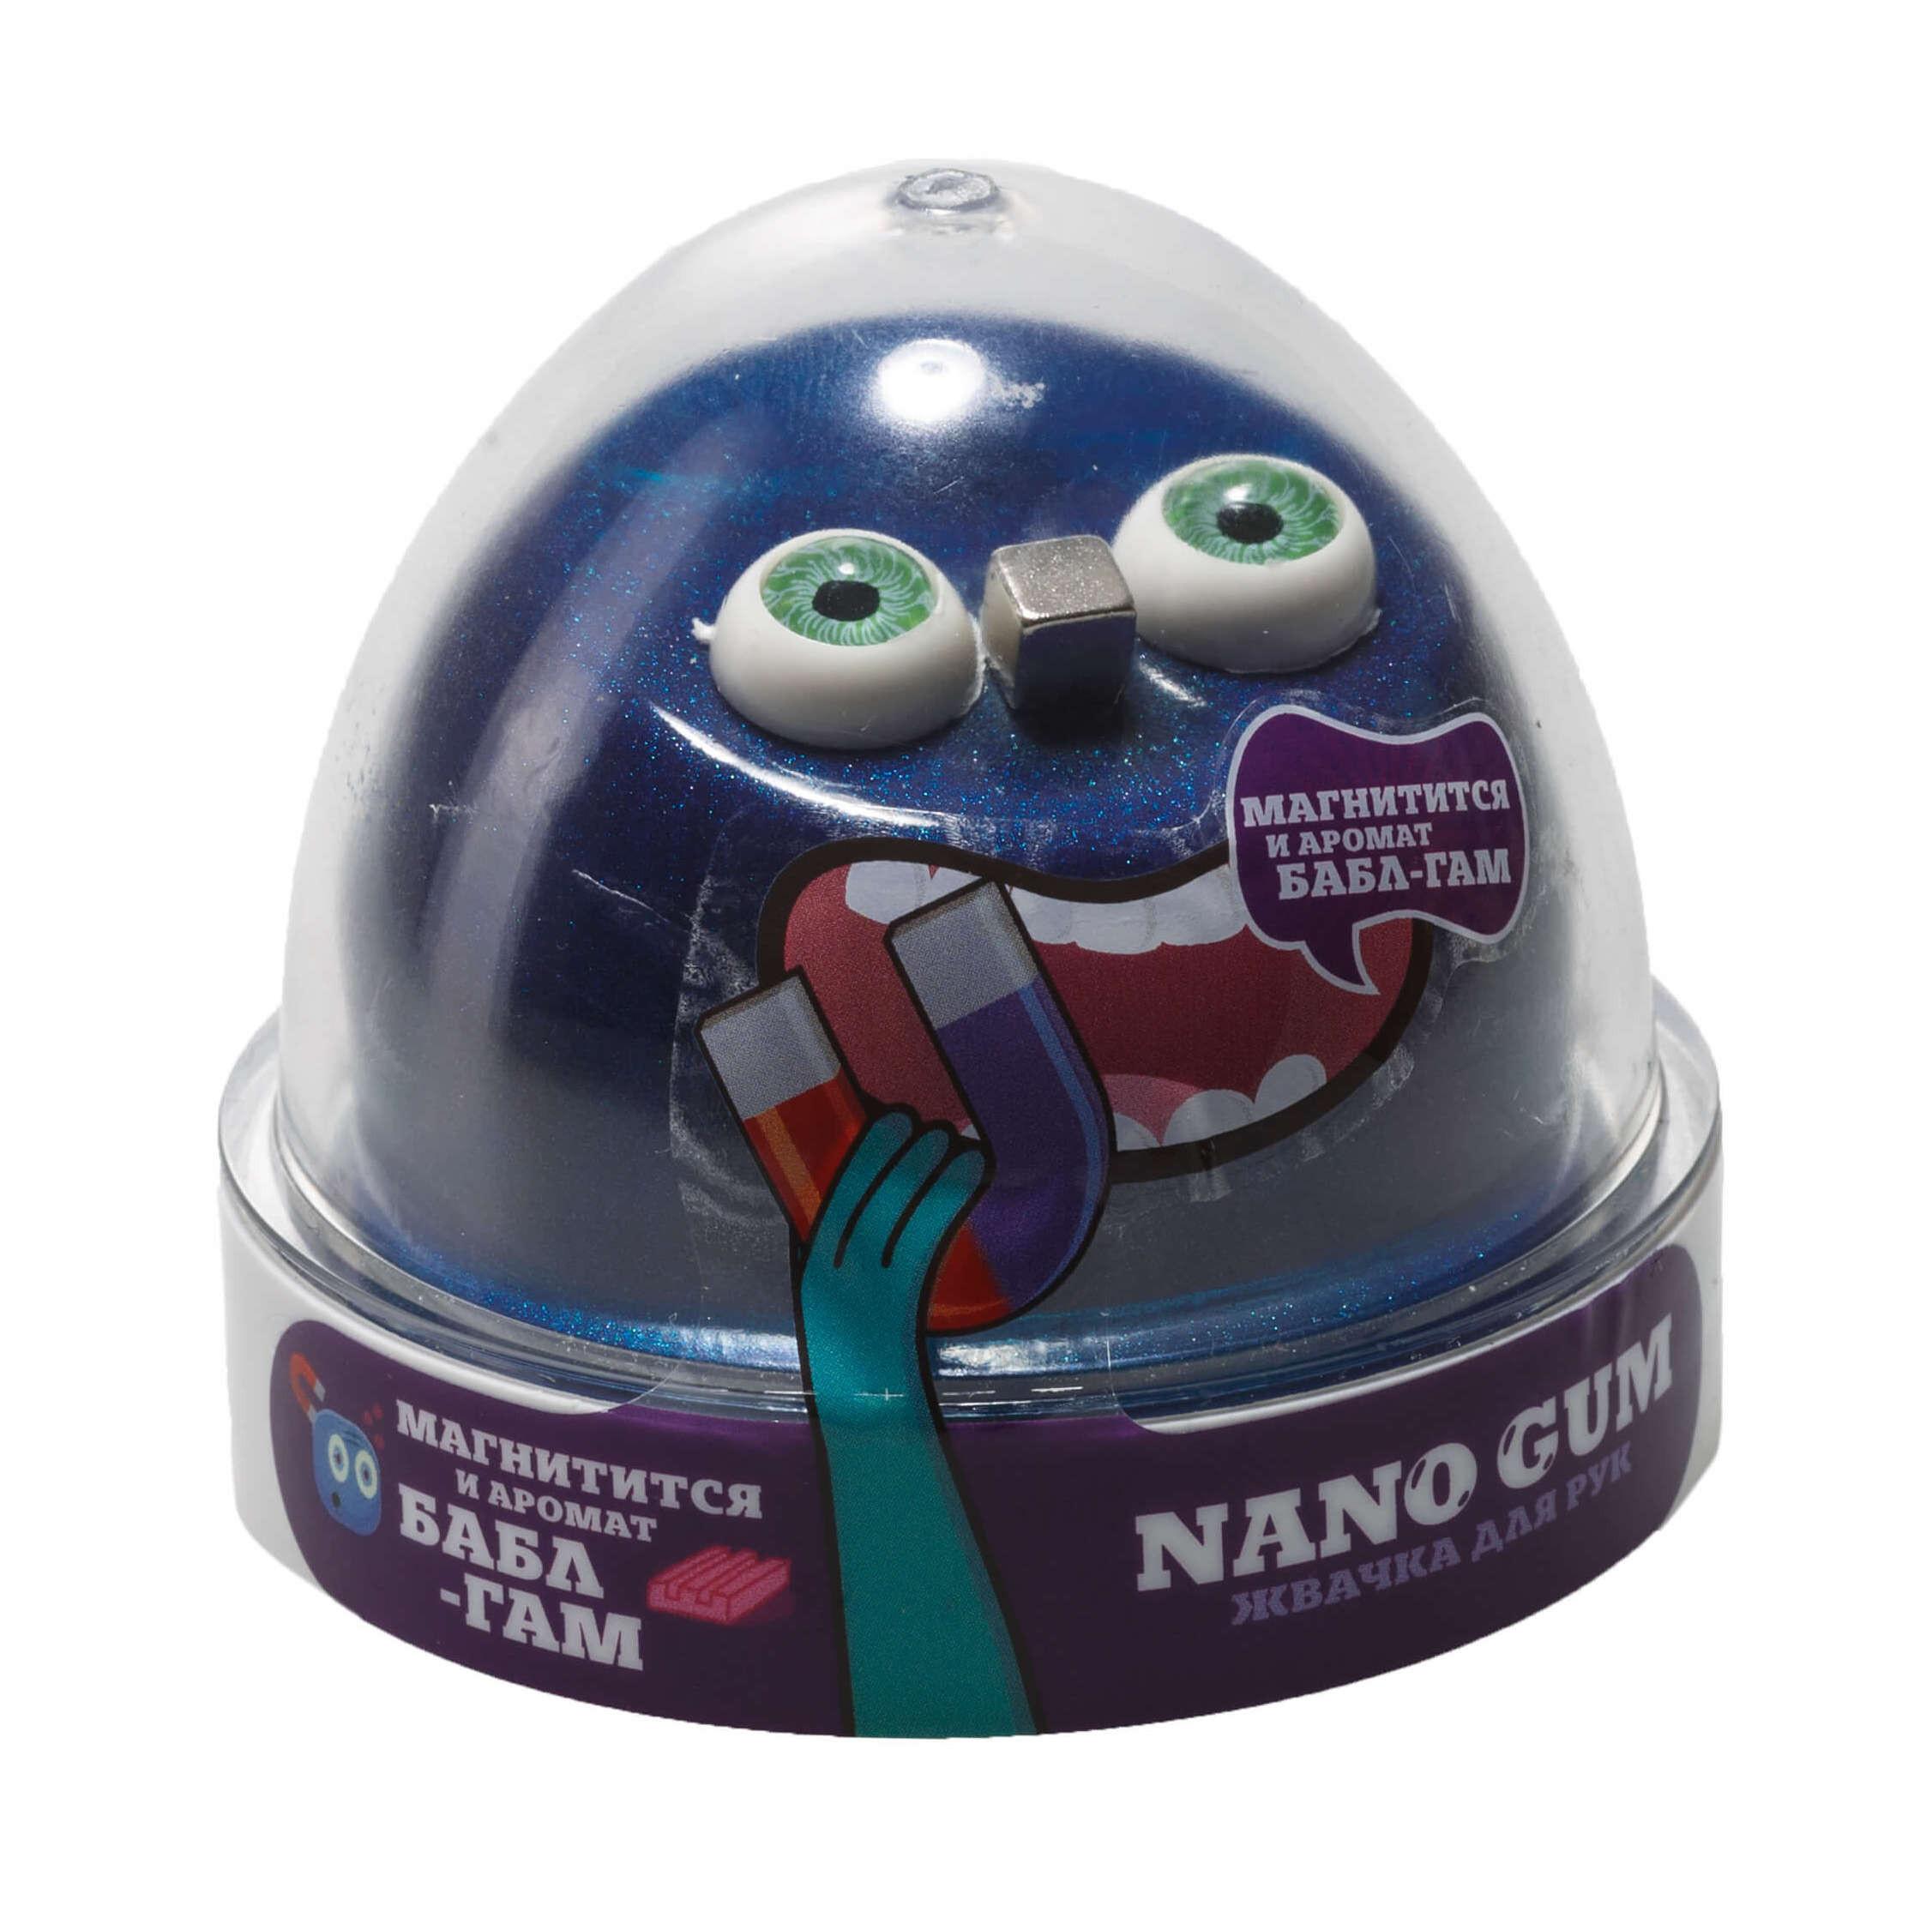 Nano gum, магнитный с ароматом баблгама от 549 руб